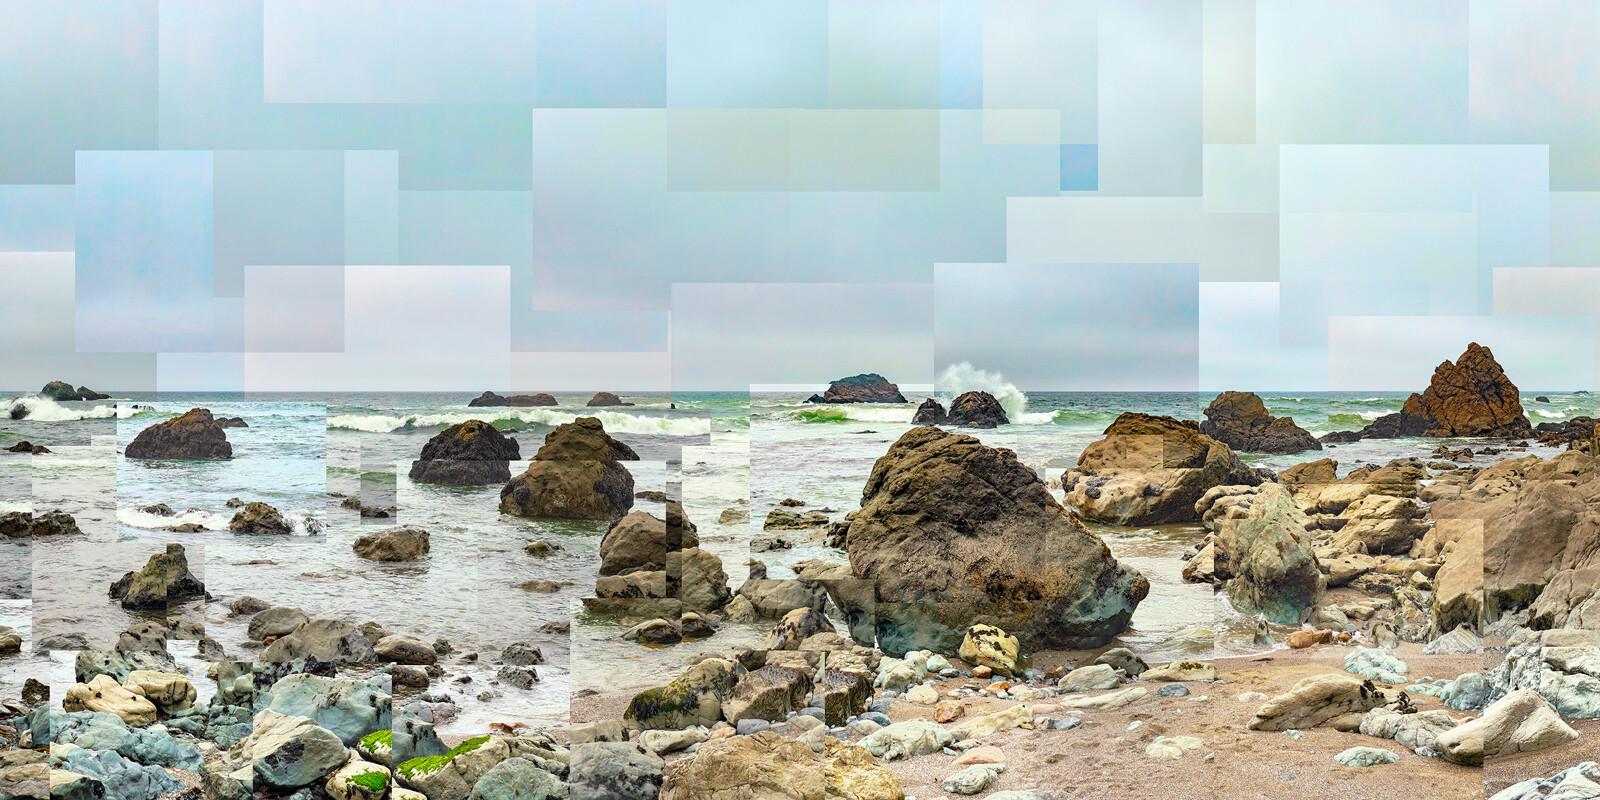 Scotty Creek Beach - Pep Ventosa